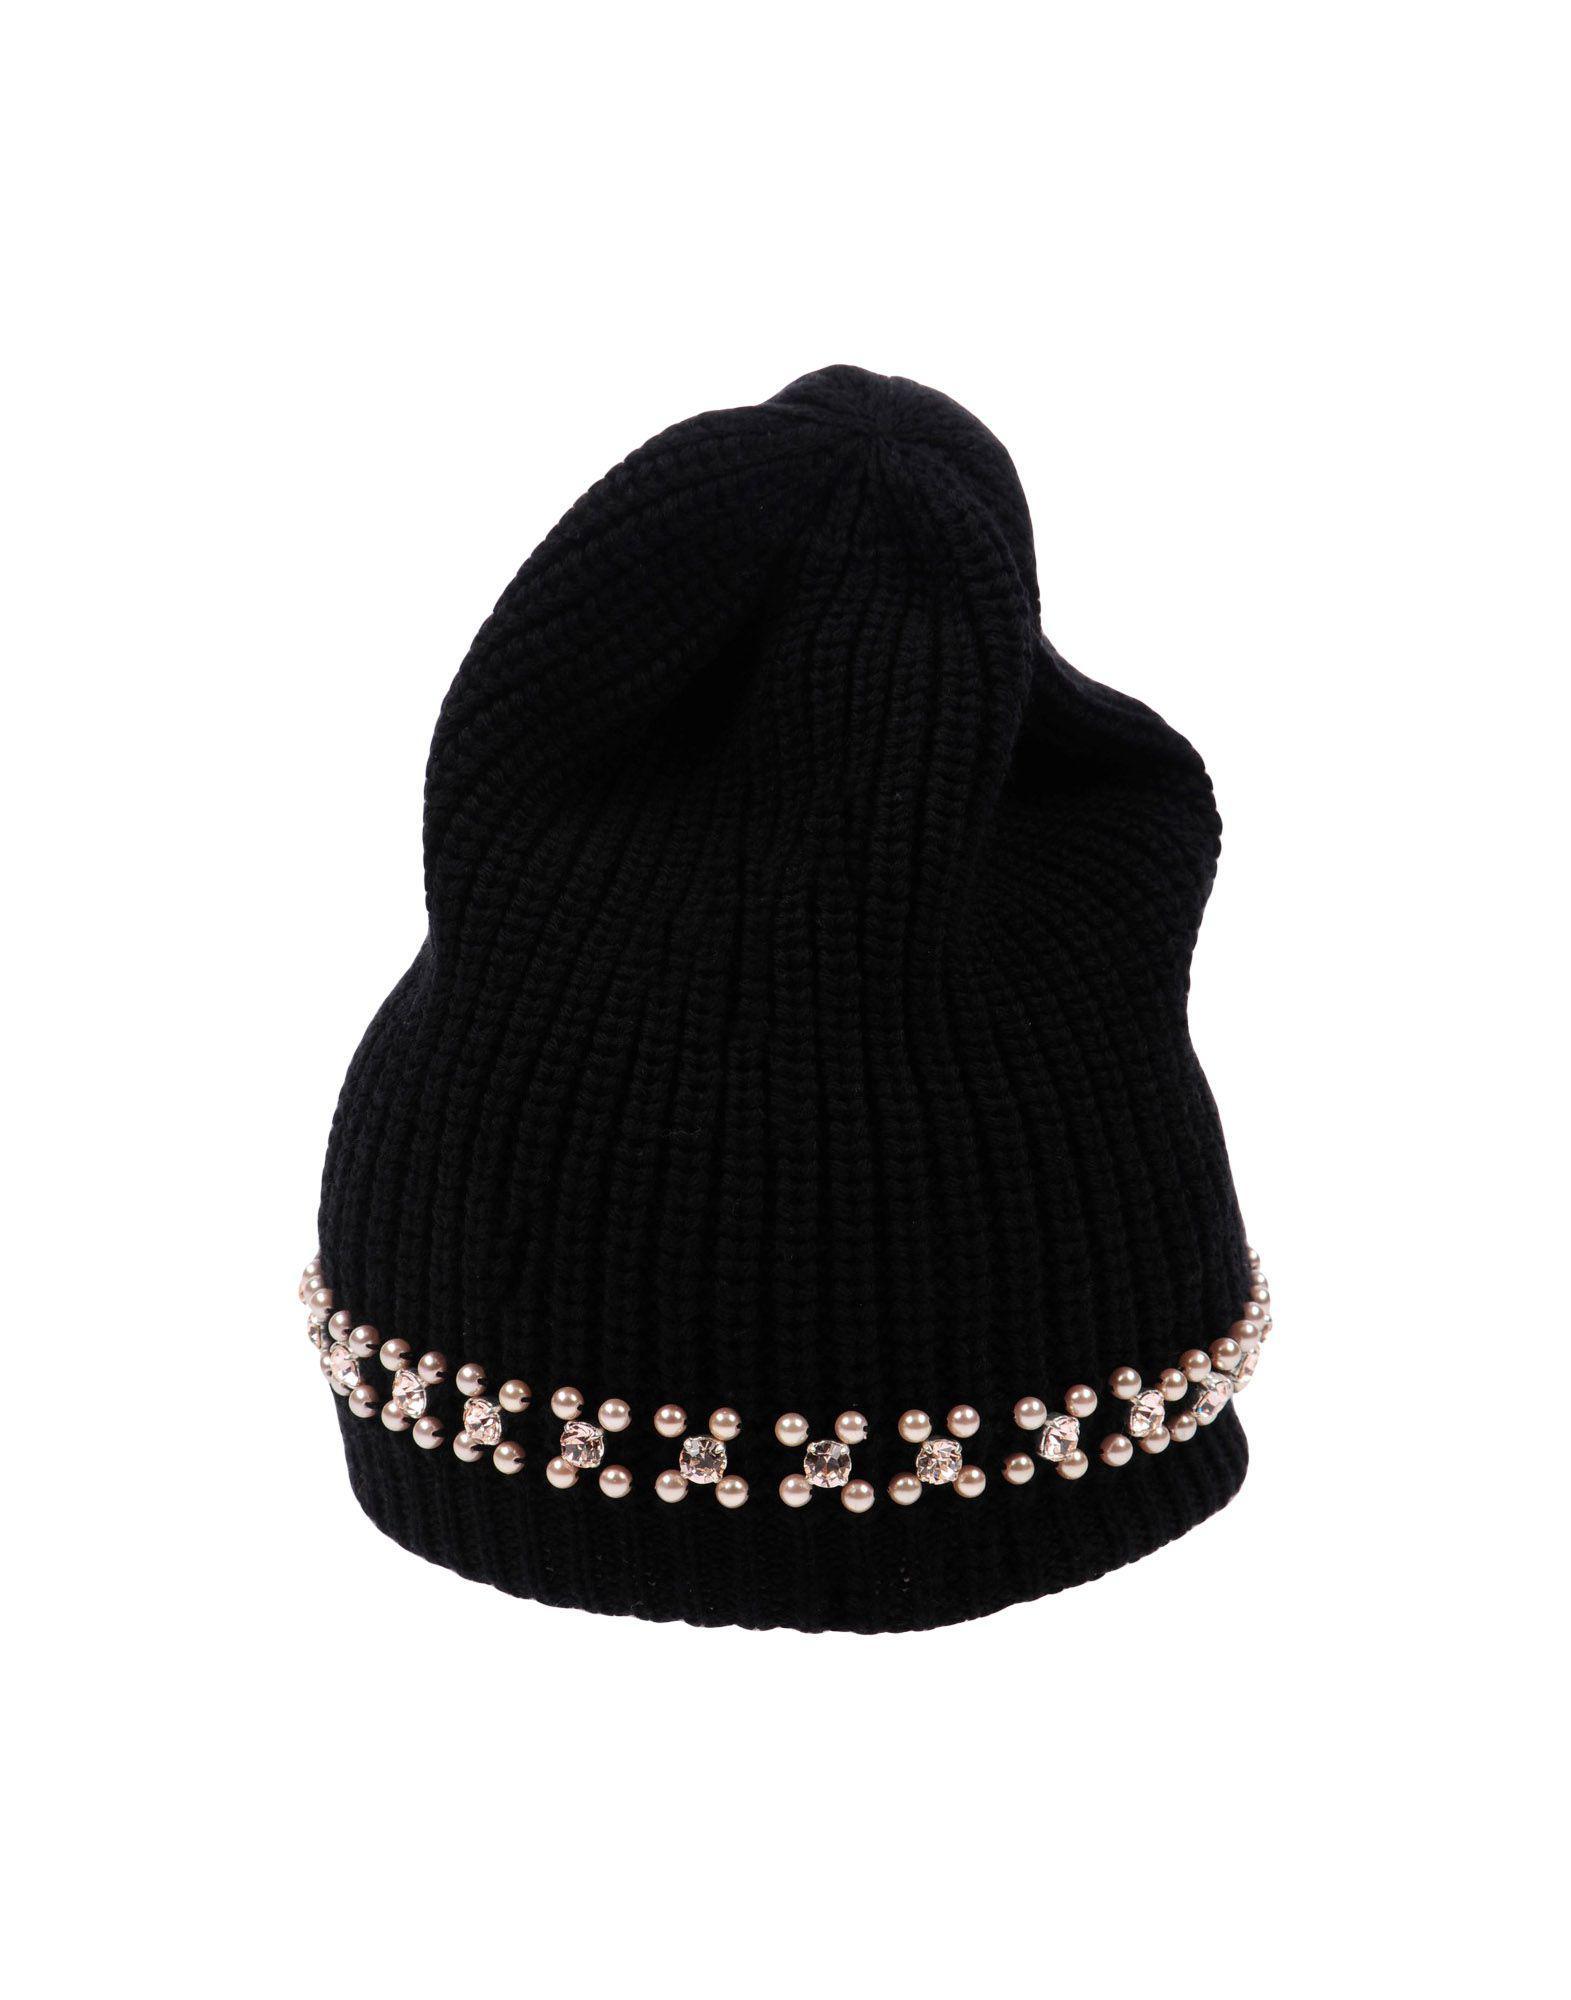 Accesorios - Sombreros Blugirl IFHnKgdmf